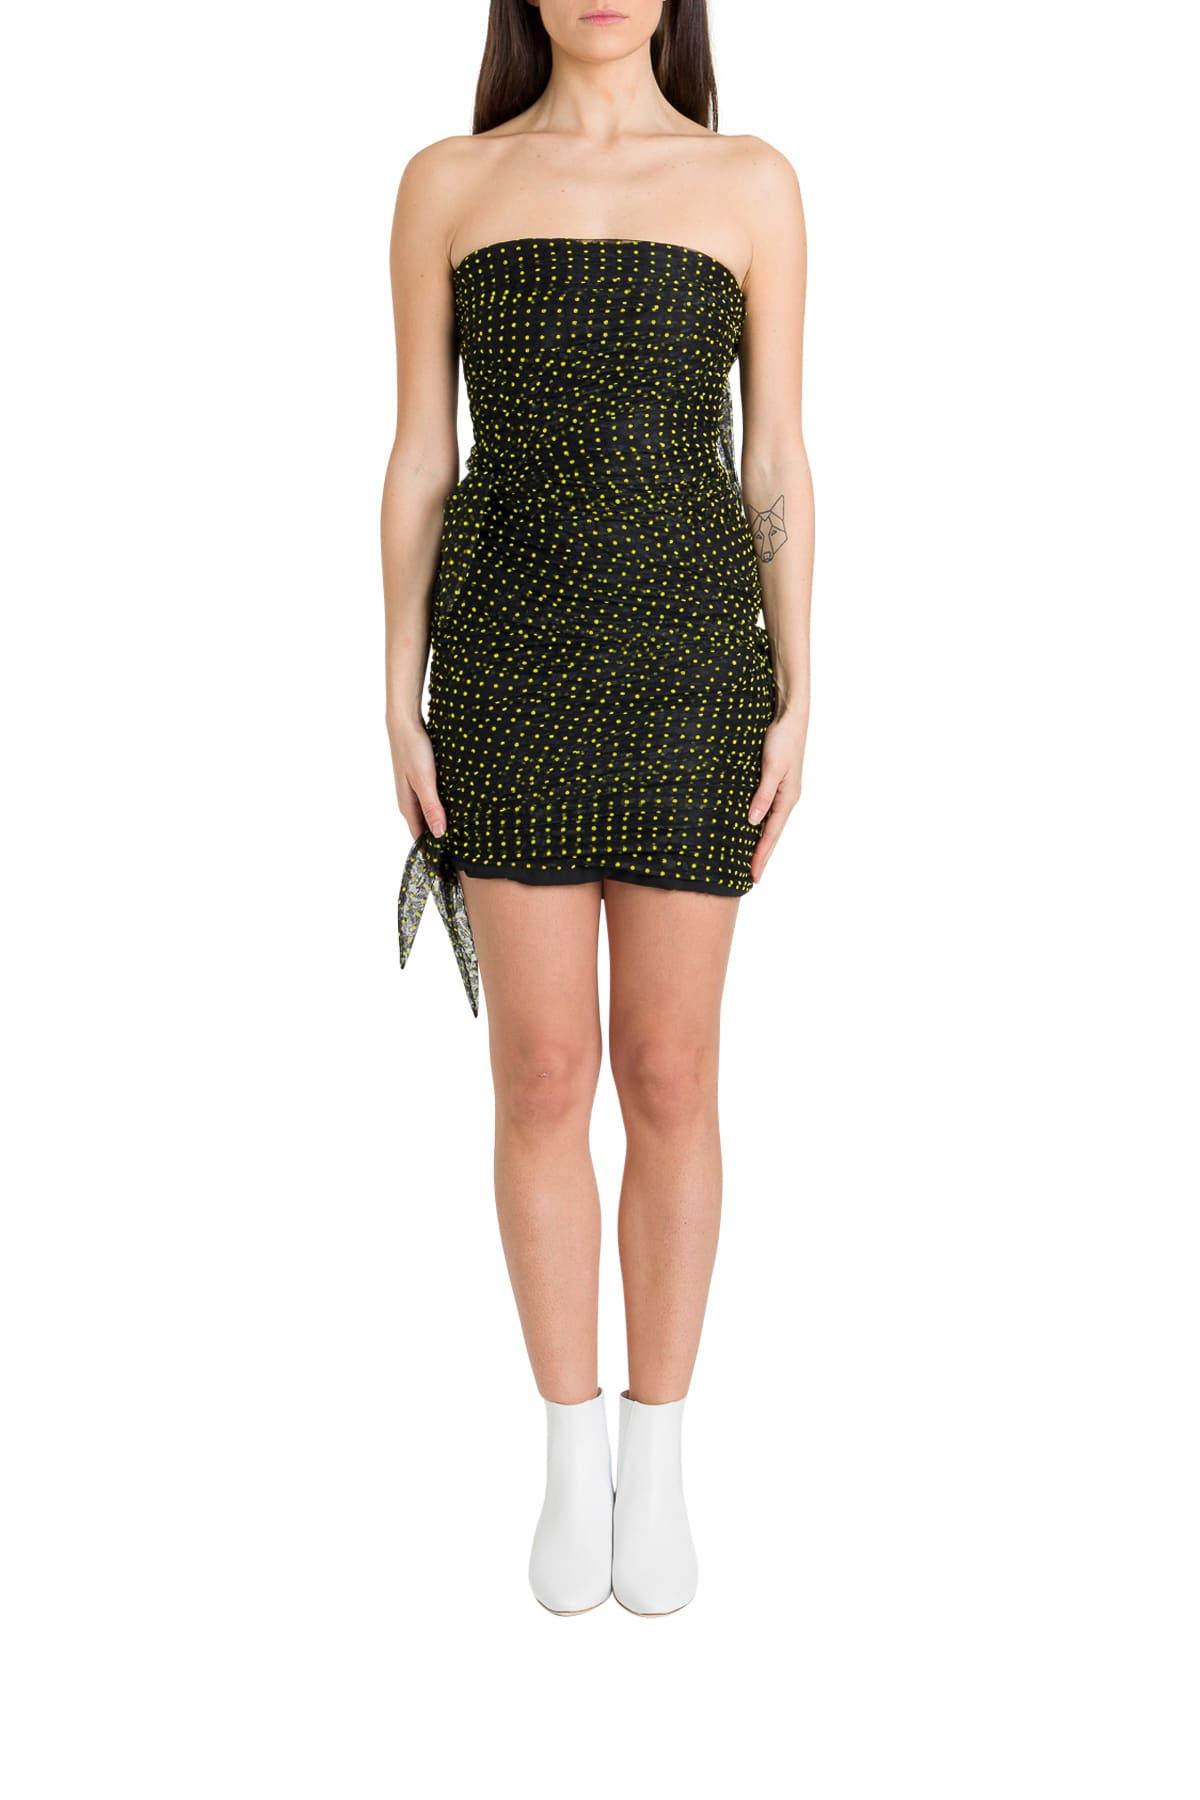 Buy Philosophy di Lorenzo Serafini Polka Dots Sheath Dress In Plumetis online, shop Philosophy di Lorenzo Serafini with free shipping